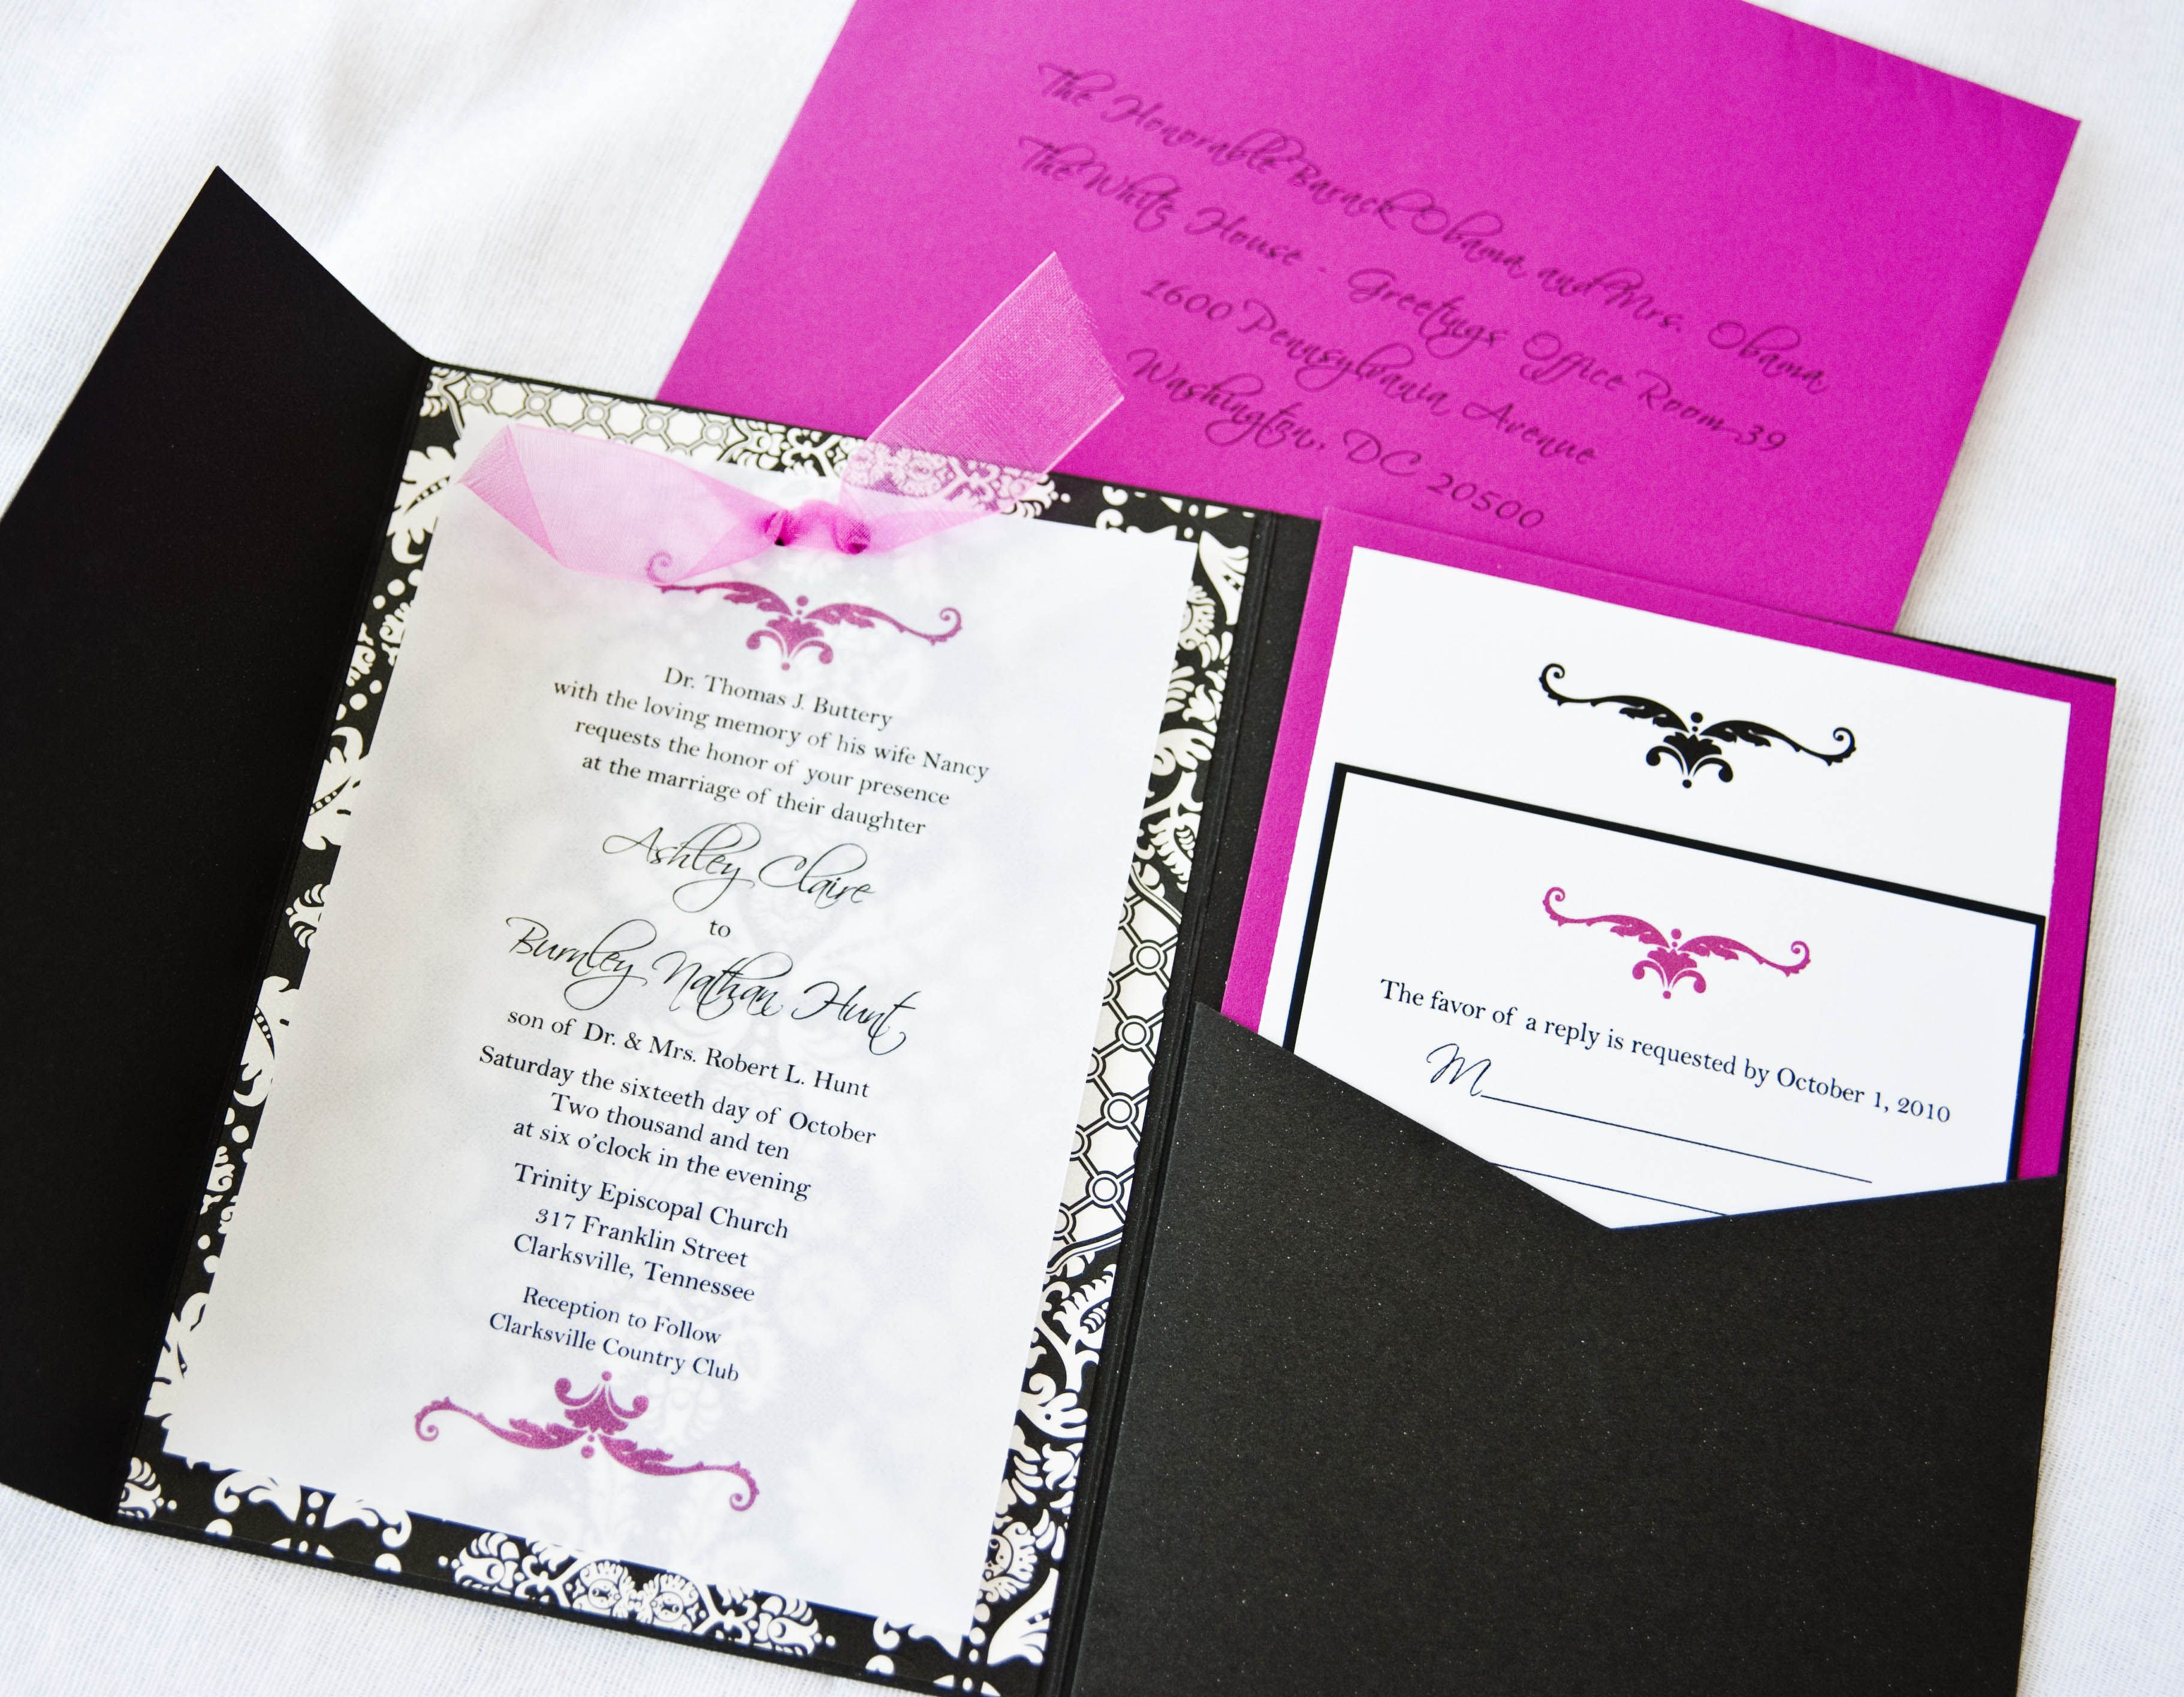 photo wedding invitations - Invitations Wedding